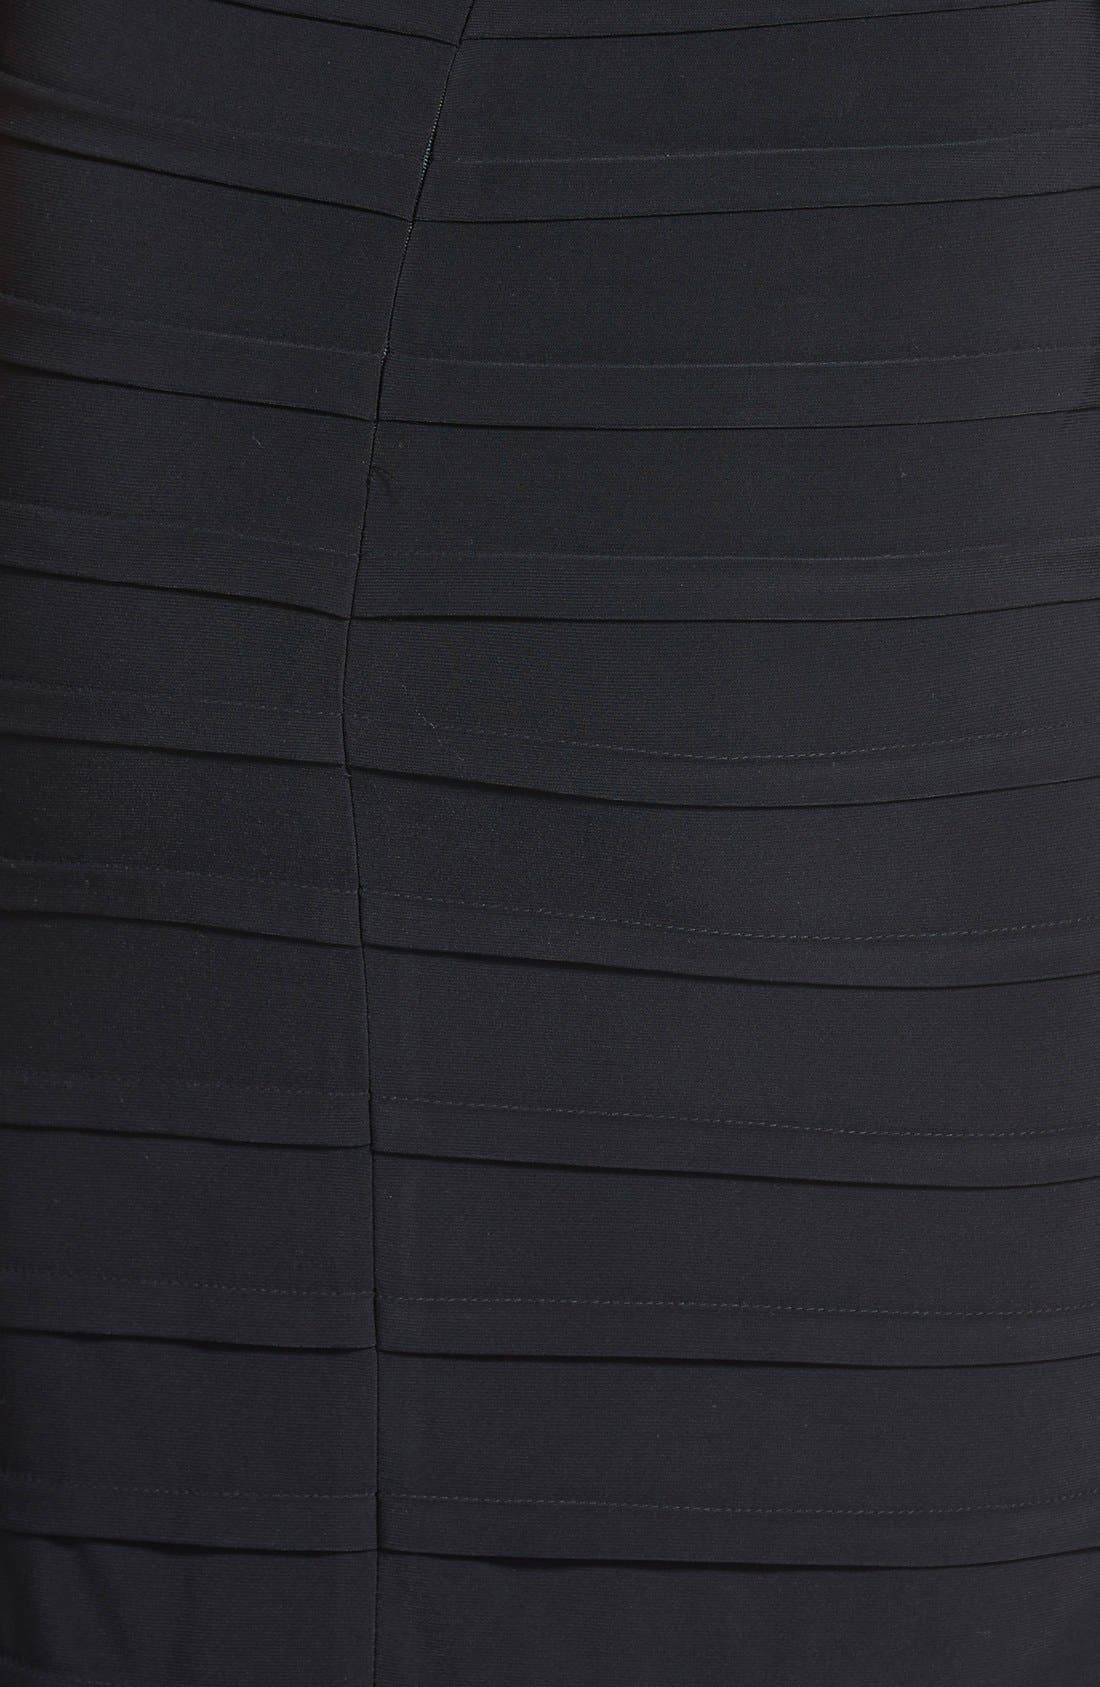 ADRIANNA PAPELL, V-Neck Shutter Pleat Sheath Dress, Alternate thumbnail 4, color, 001